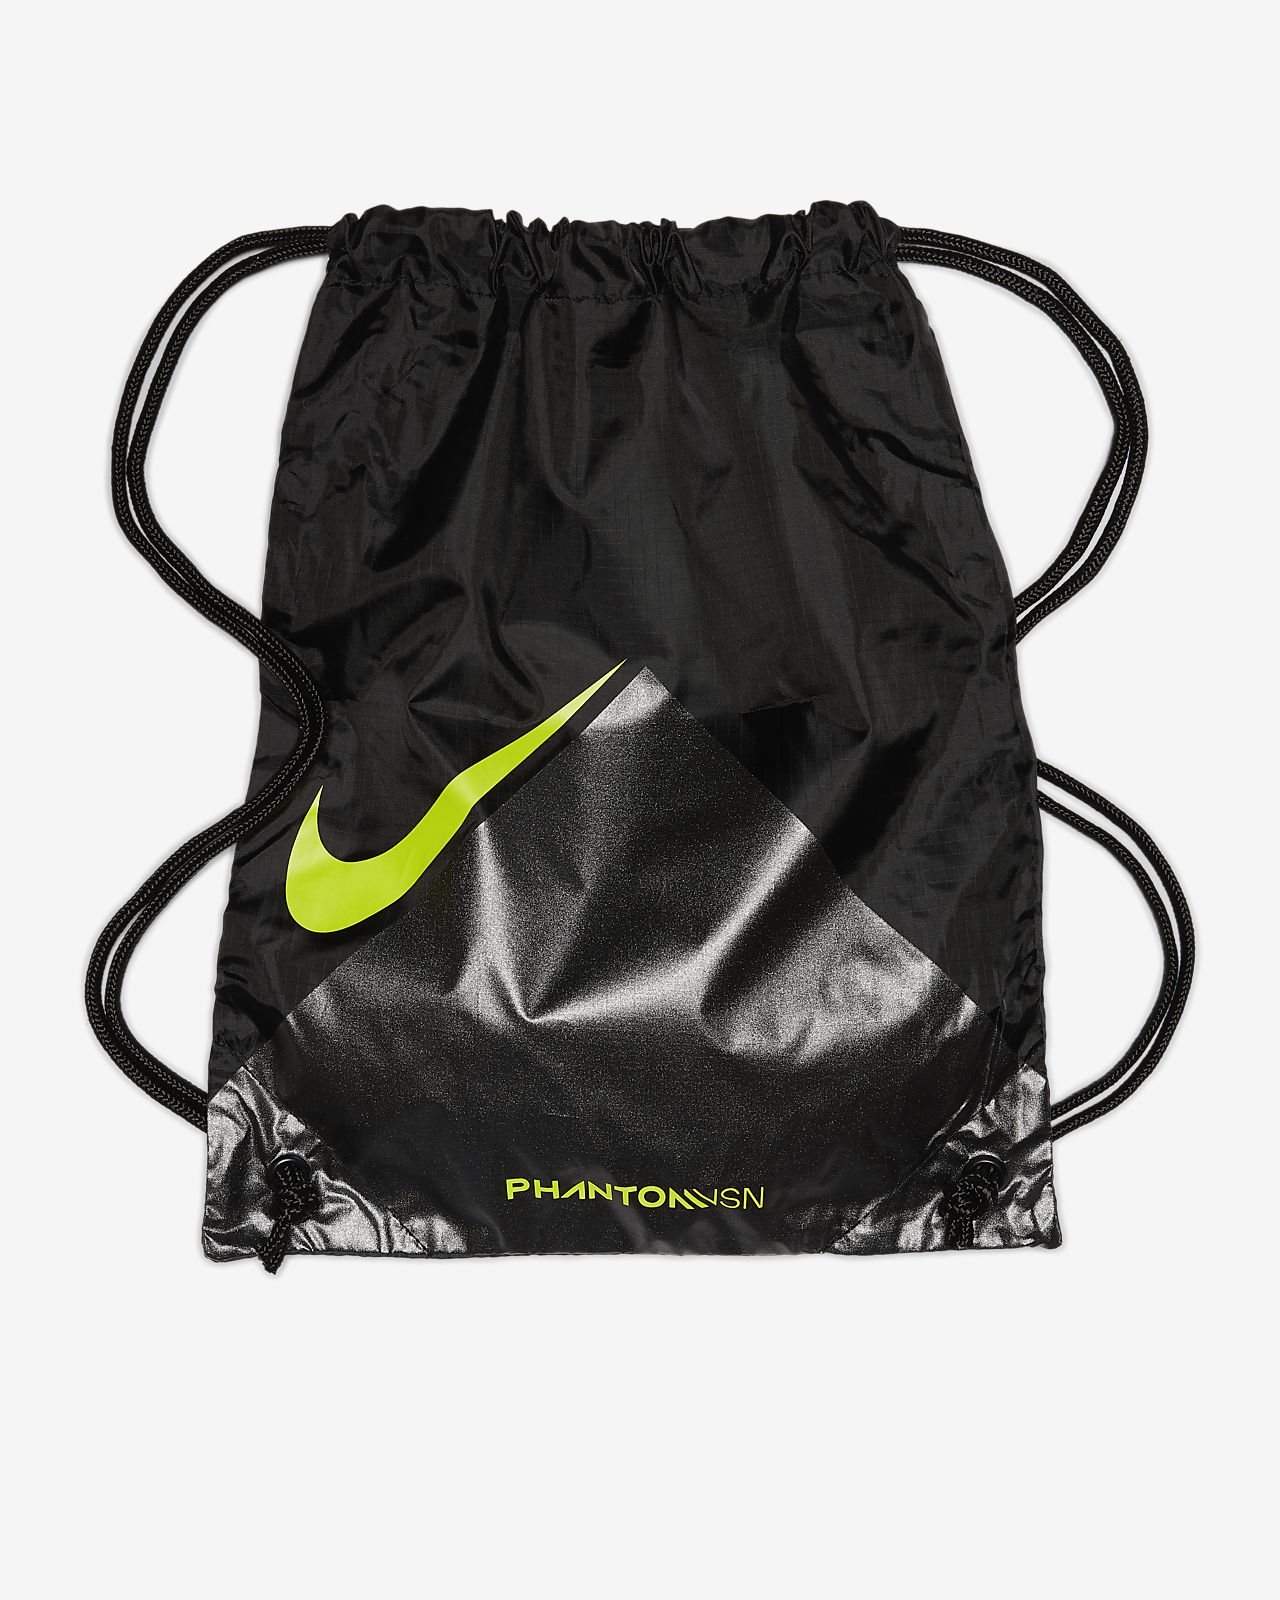 b818a9d00 ... Nike Phantom Vision Elite Dynamic Fit FG Firm-Ground Soccer Cleat